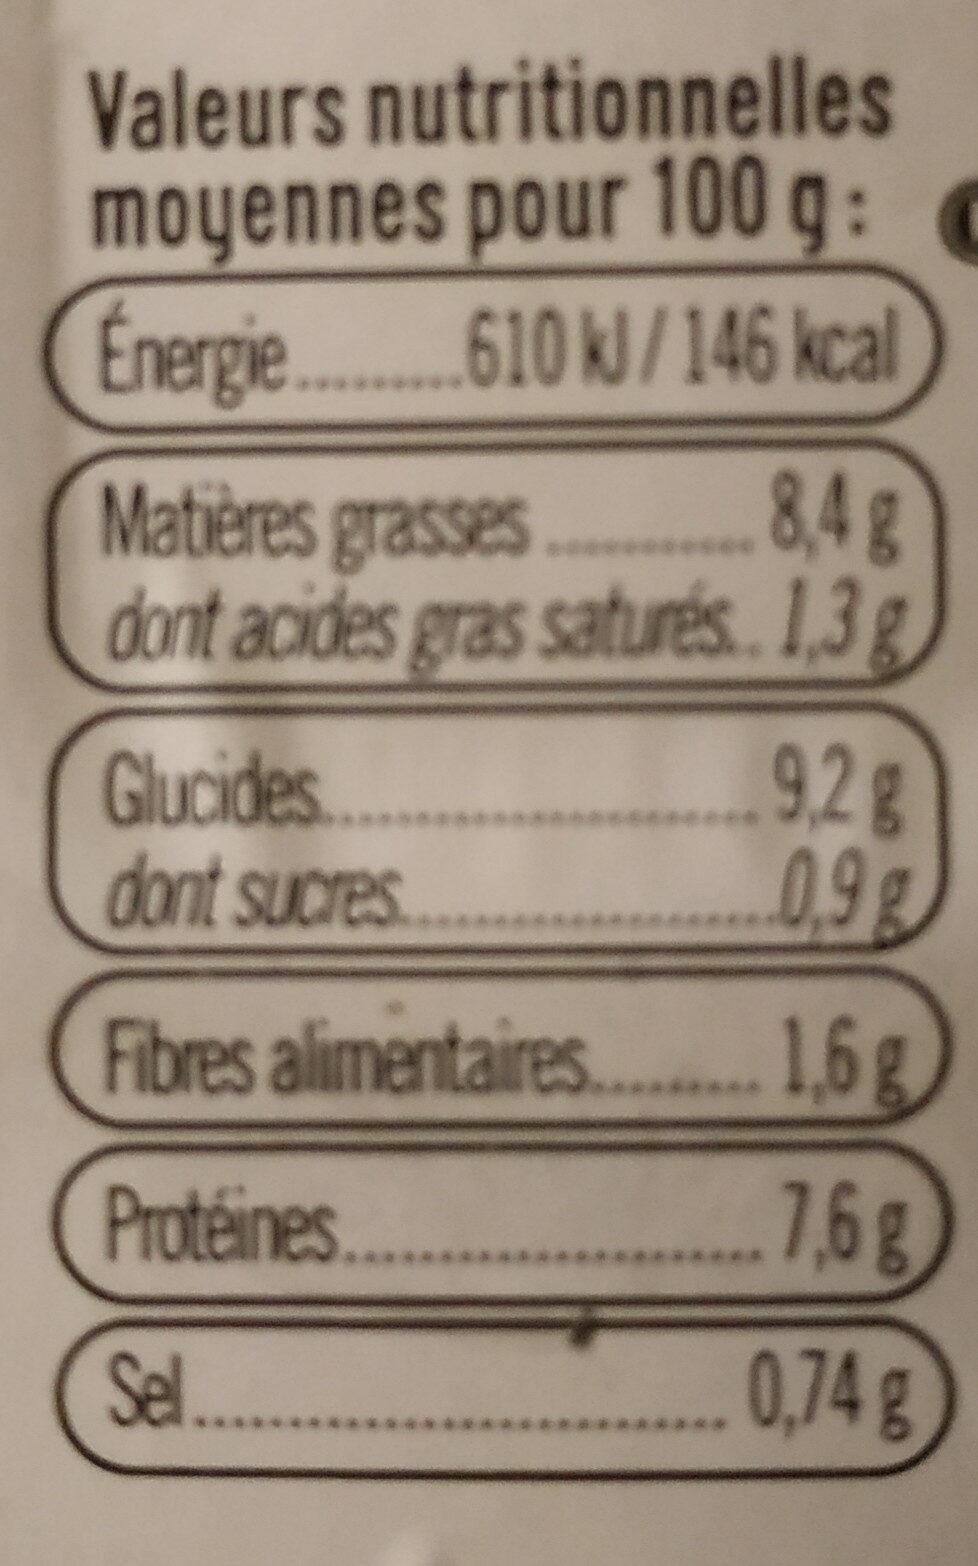 Brandade de morue transformée en France - Informations nutritionnelles - fr